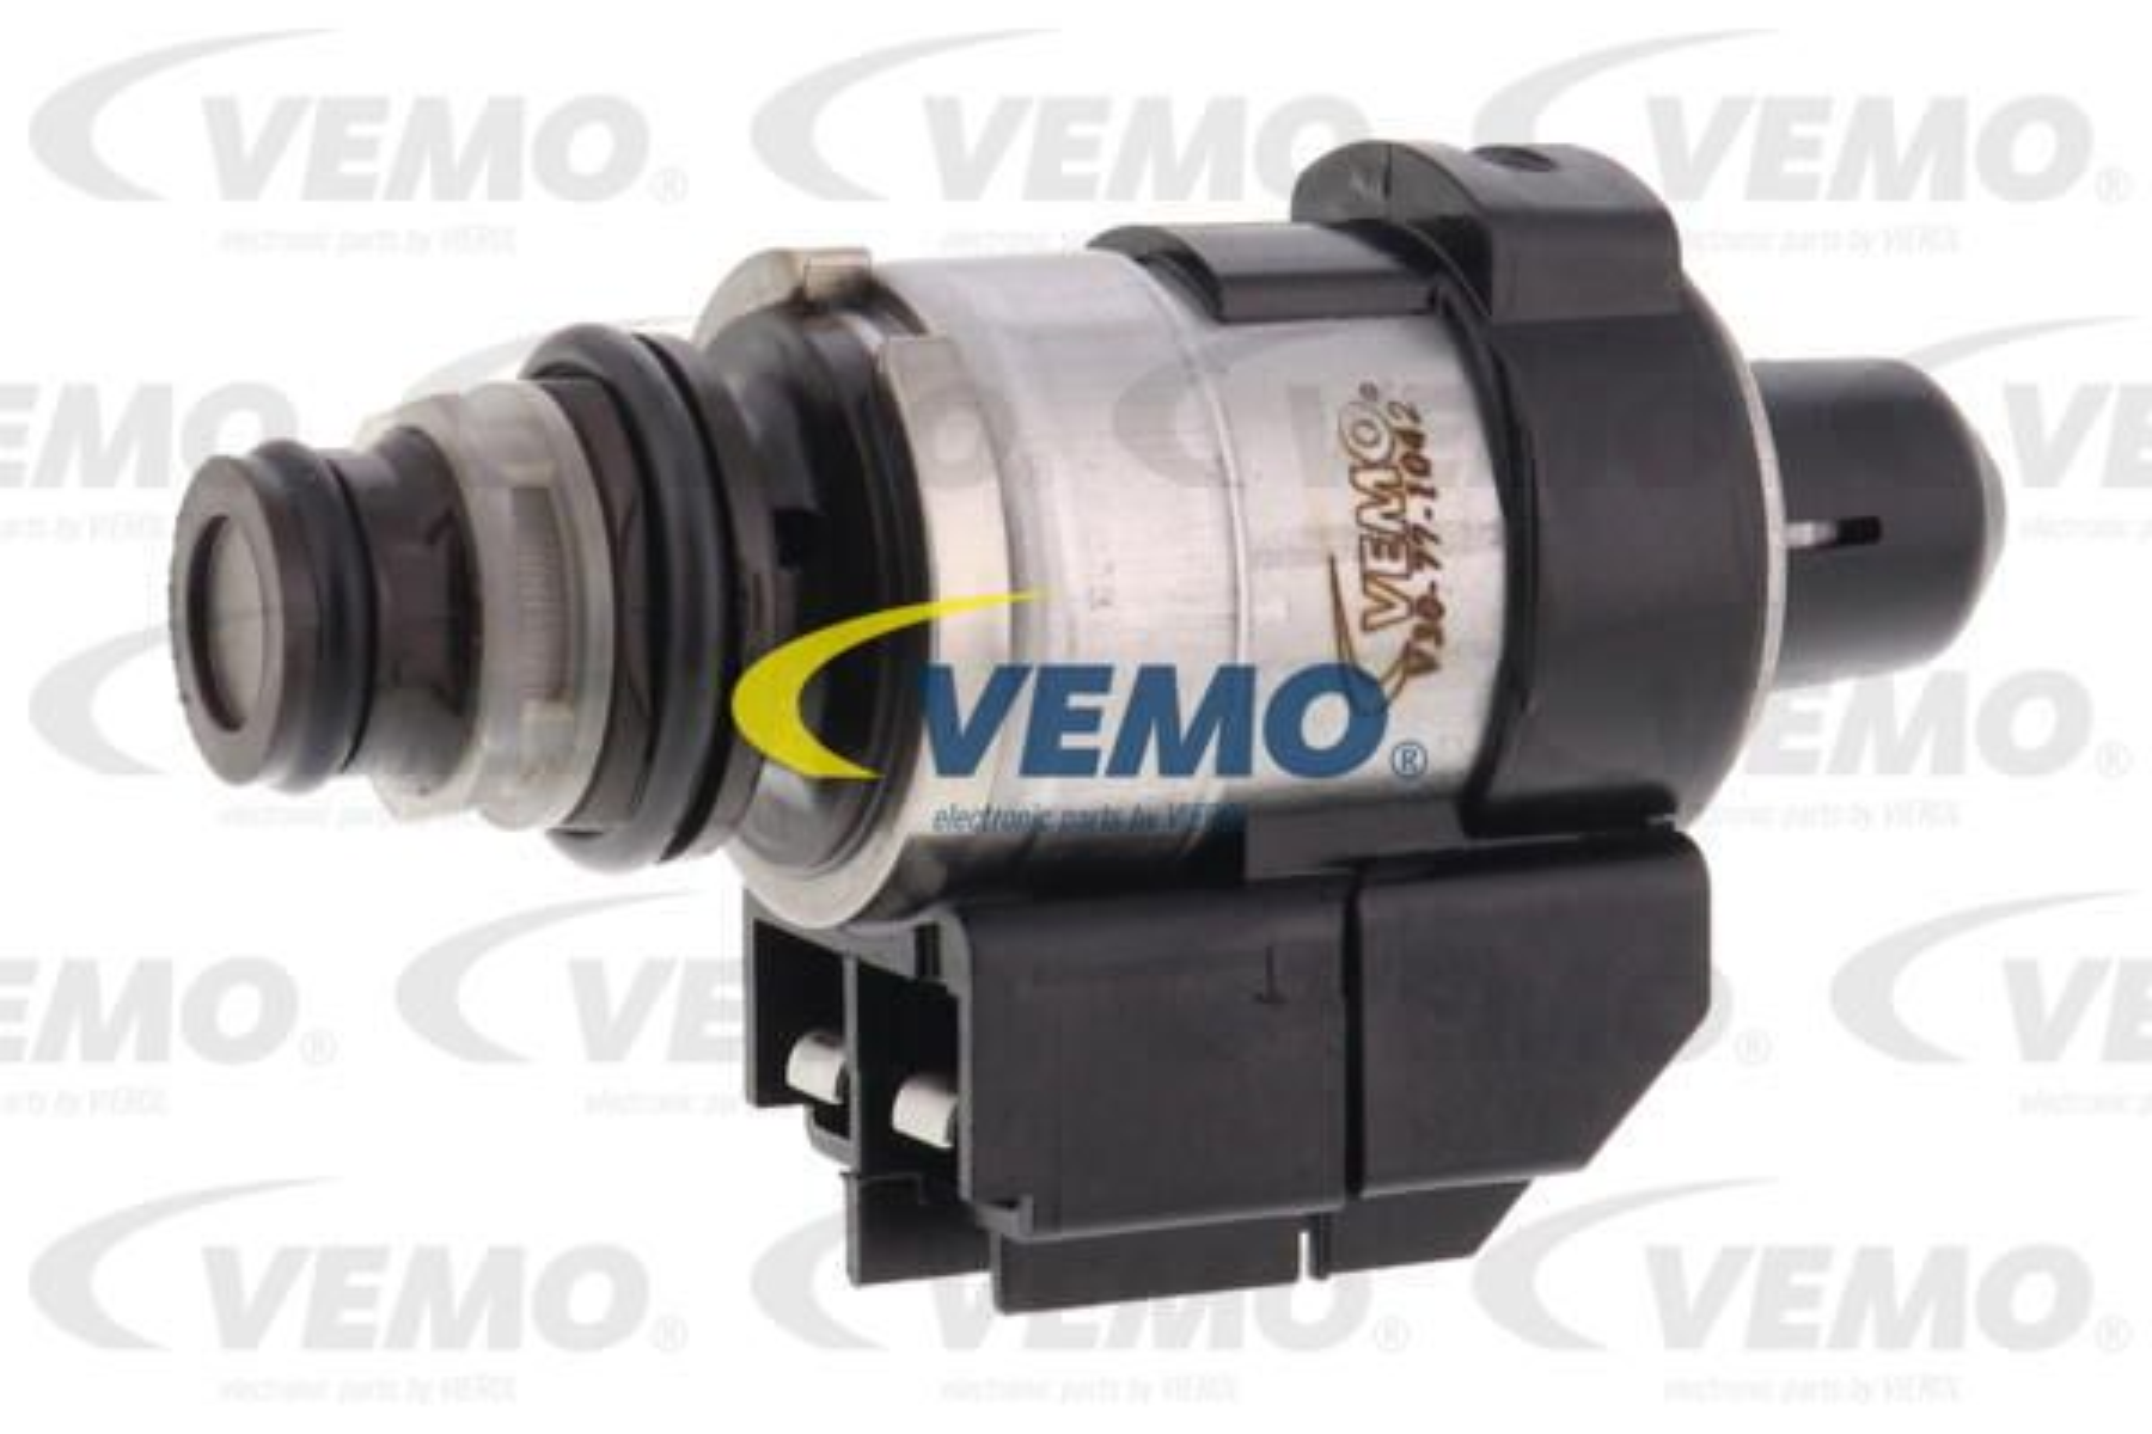 MERCEDES-BENZ C-Klasse 2018 Schaltventil, Automatikgetriebe - Original VEMO V30-77-1042